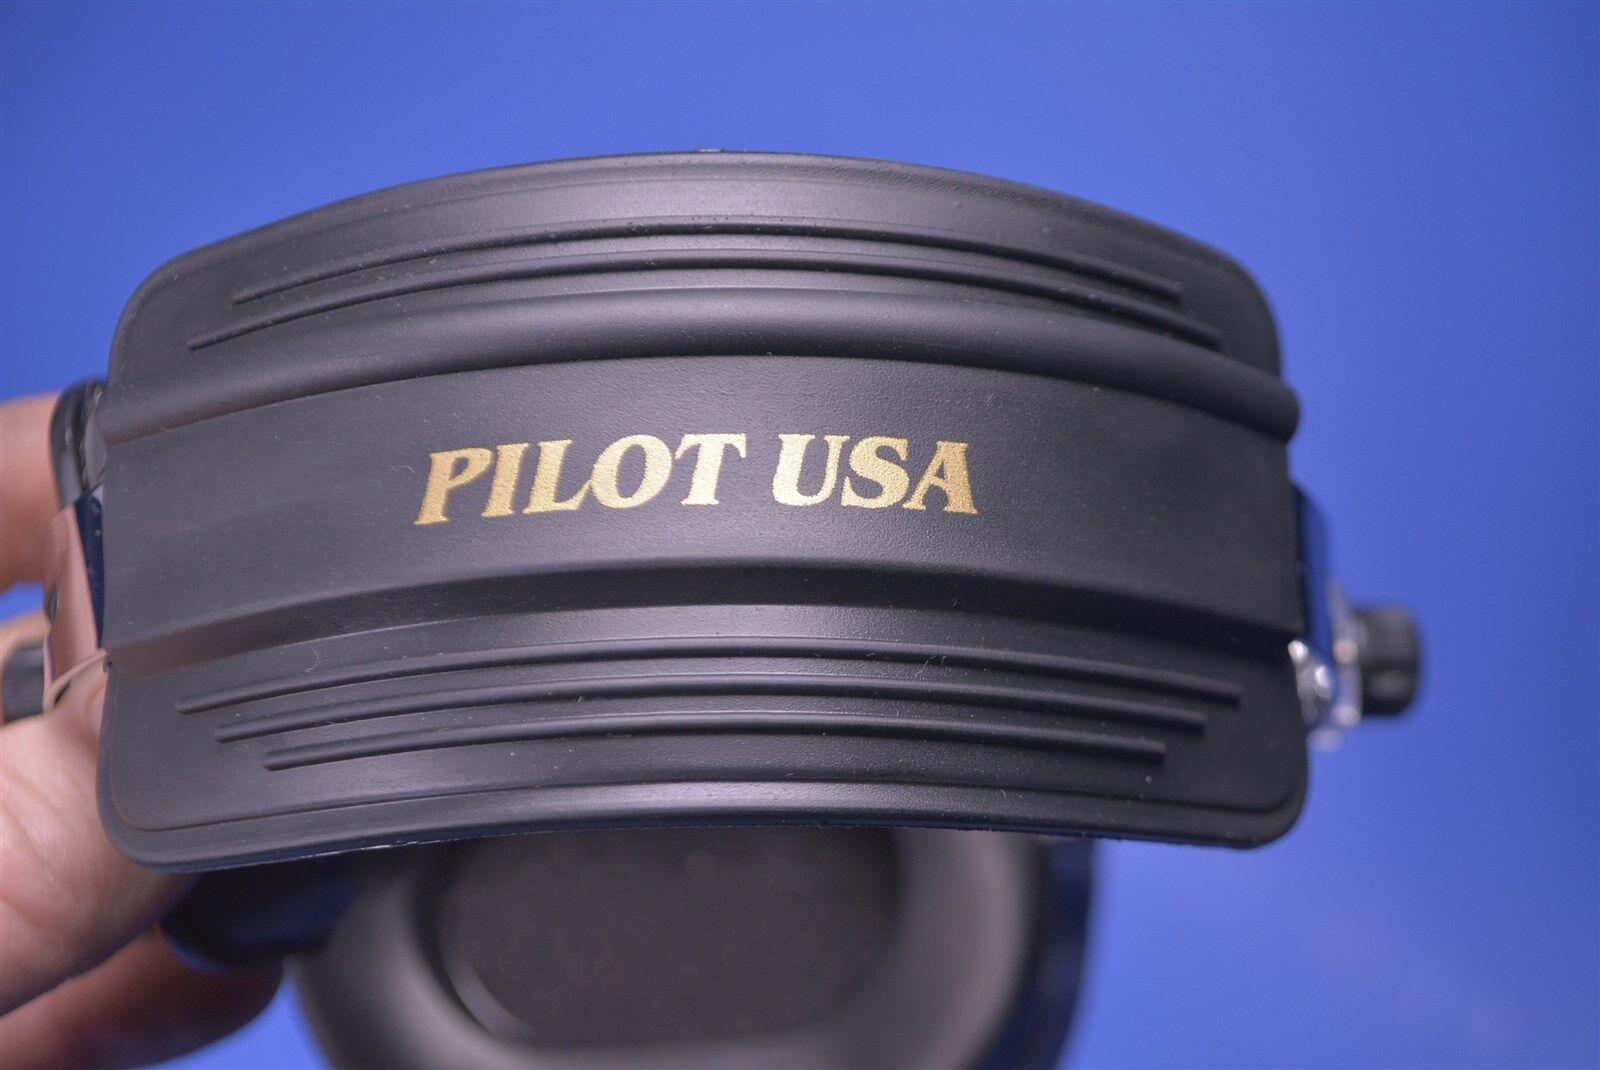 Pilot Communications Noise-Cancelling Headset for Aircraft Pilot Avionics